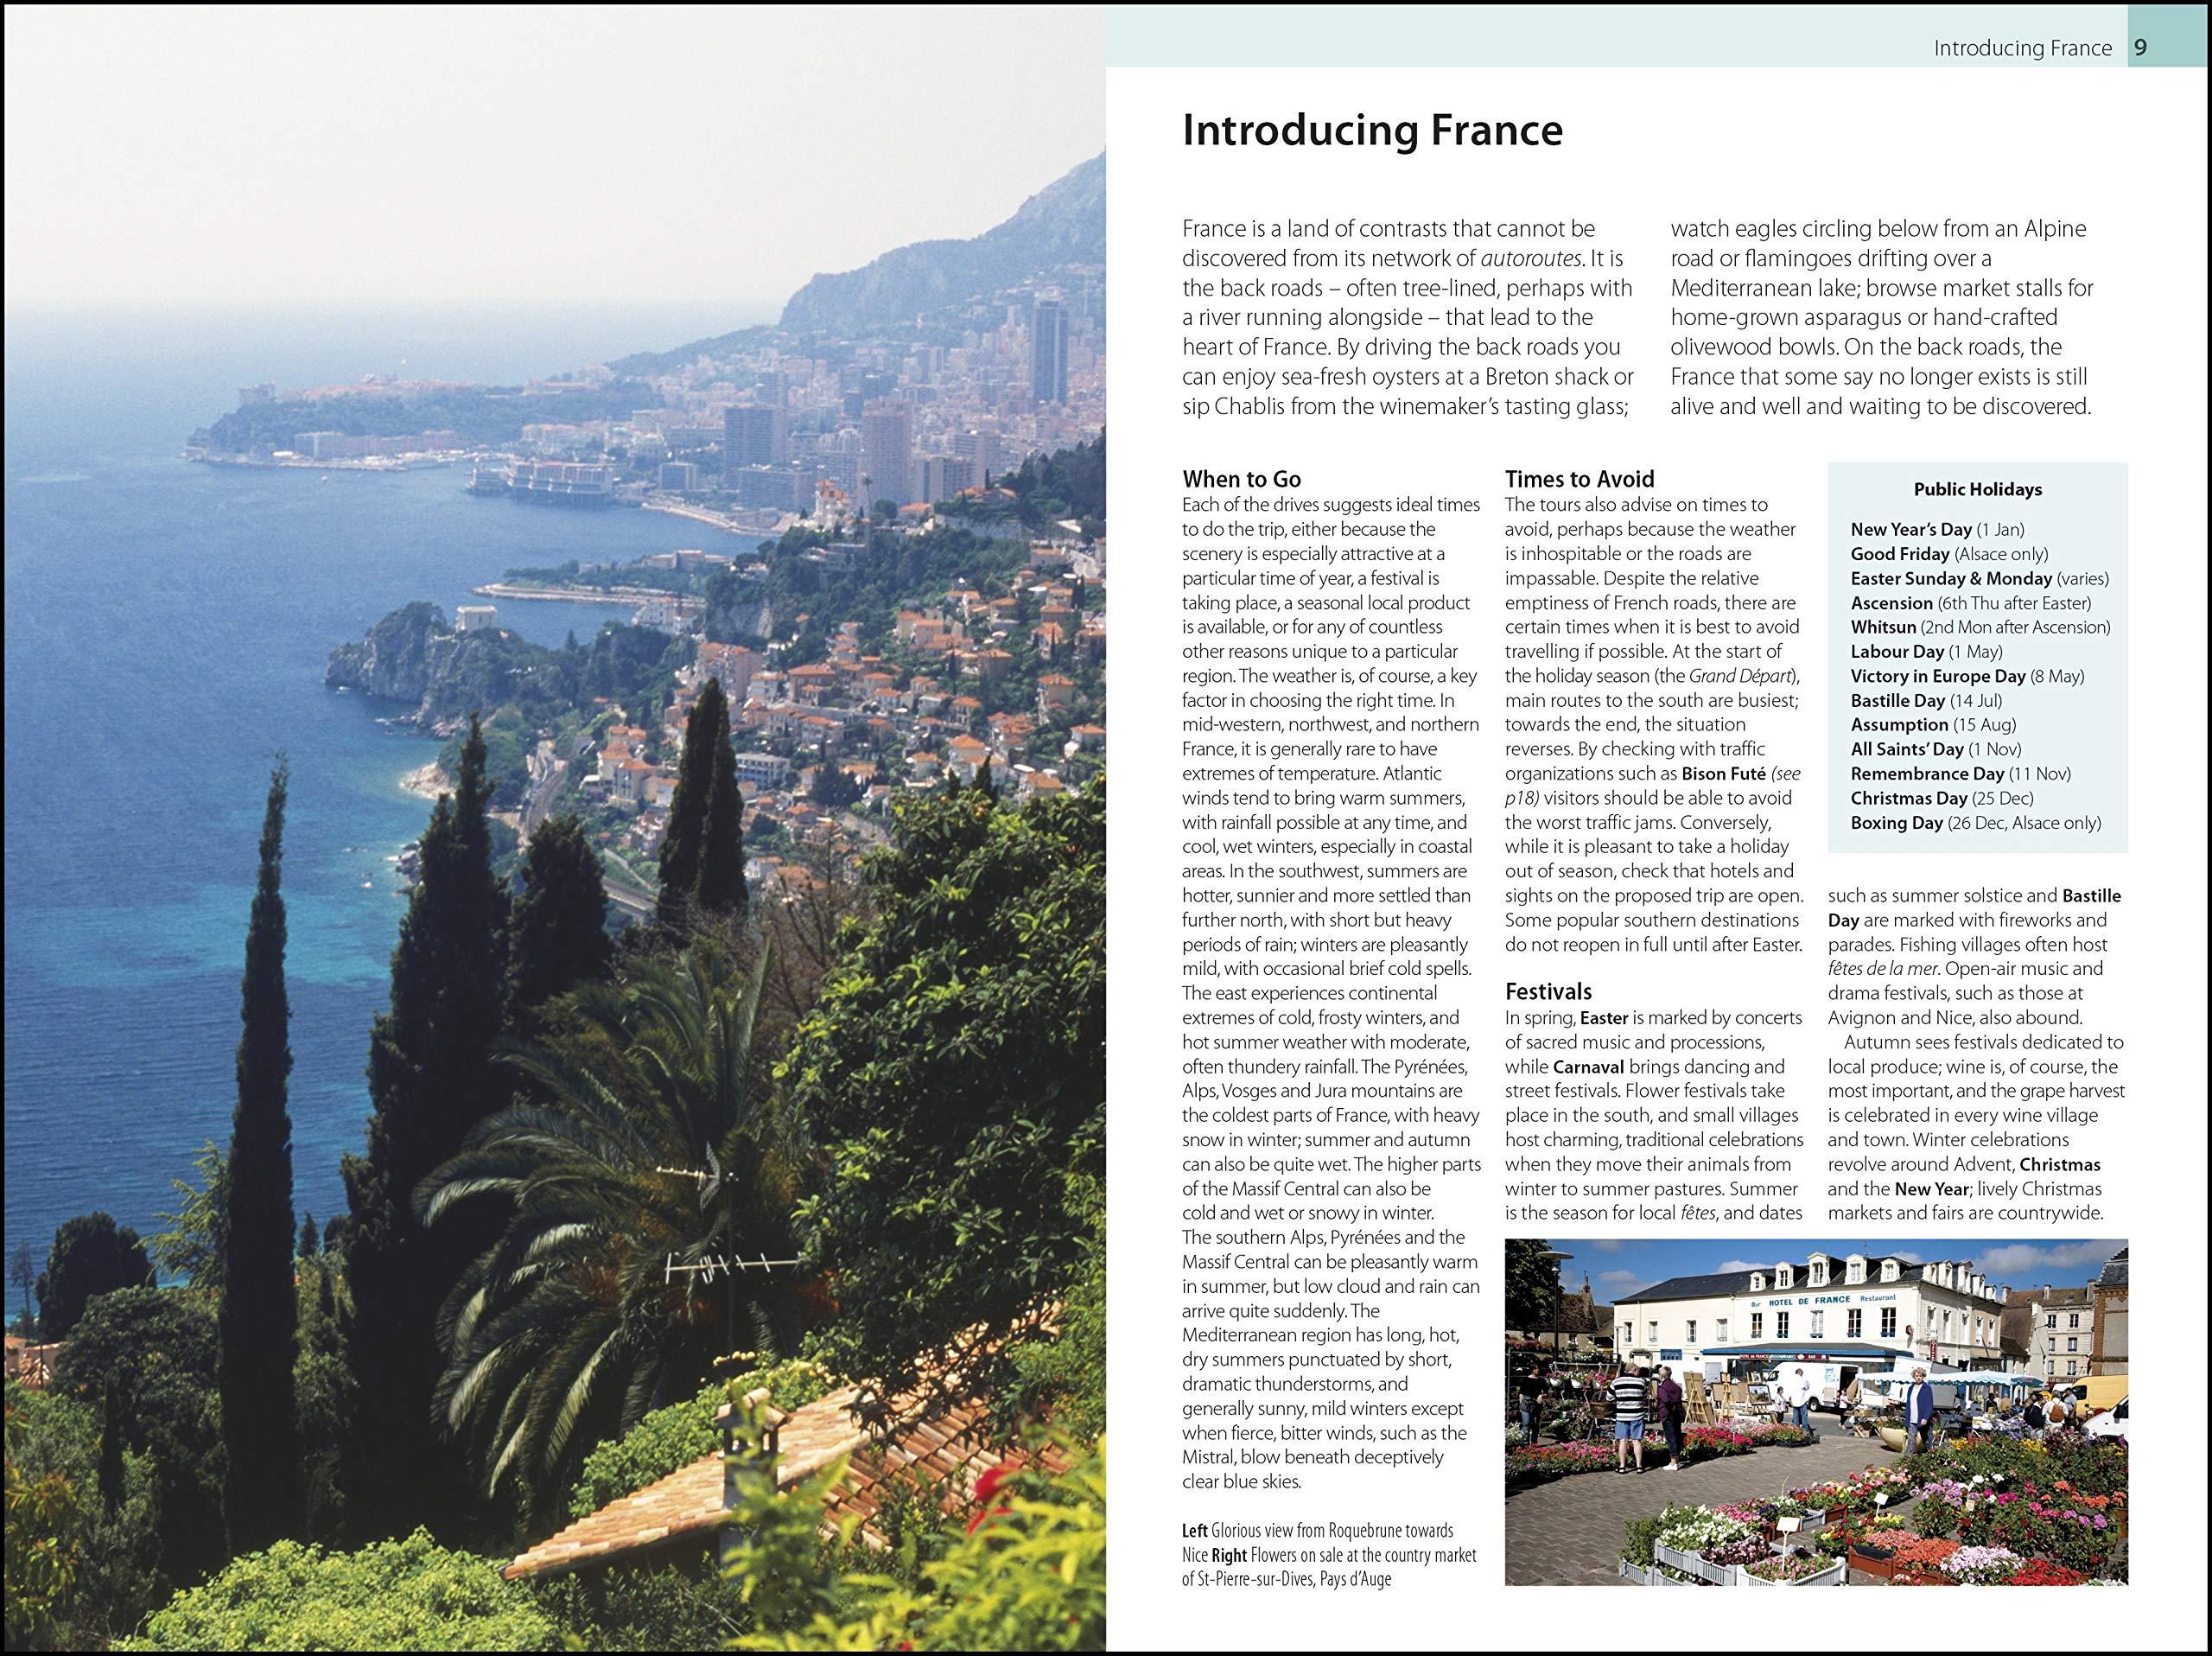 France Back Roads DK Eyewitness Travel Guide Idioma Inglés: Amazon.es: Vv.Aa, Vv.Aa: Libros en idiomas extranjeros